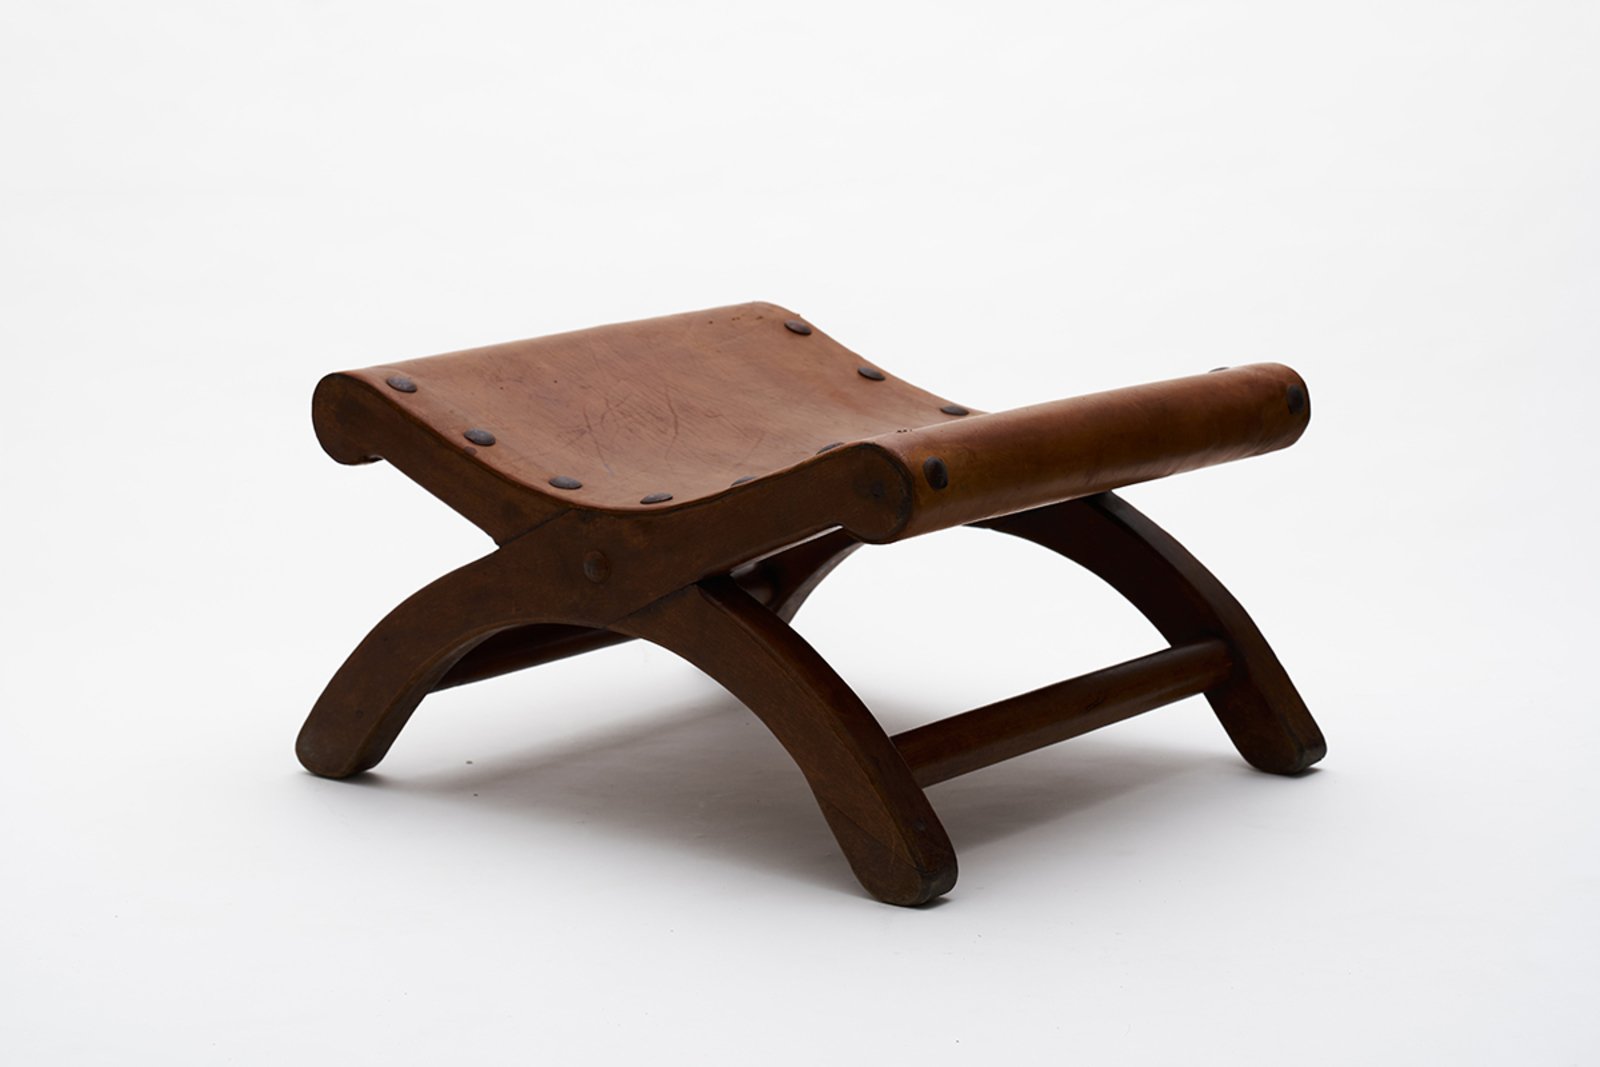 Ottoman, 1960, cedar wood, cowhide leather, iron nails, 58 x 68 x 38 cm. Courtesy of SHOP Taka Ishii Gallery, Hong Kong / Photo: Anthony Kar-Long Fan